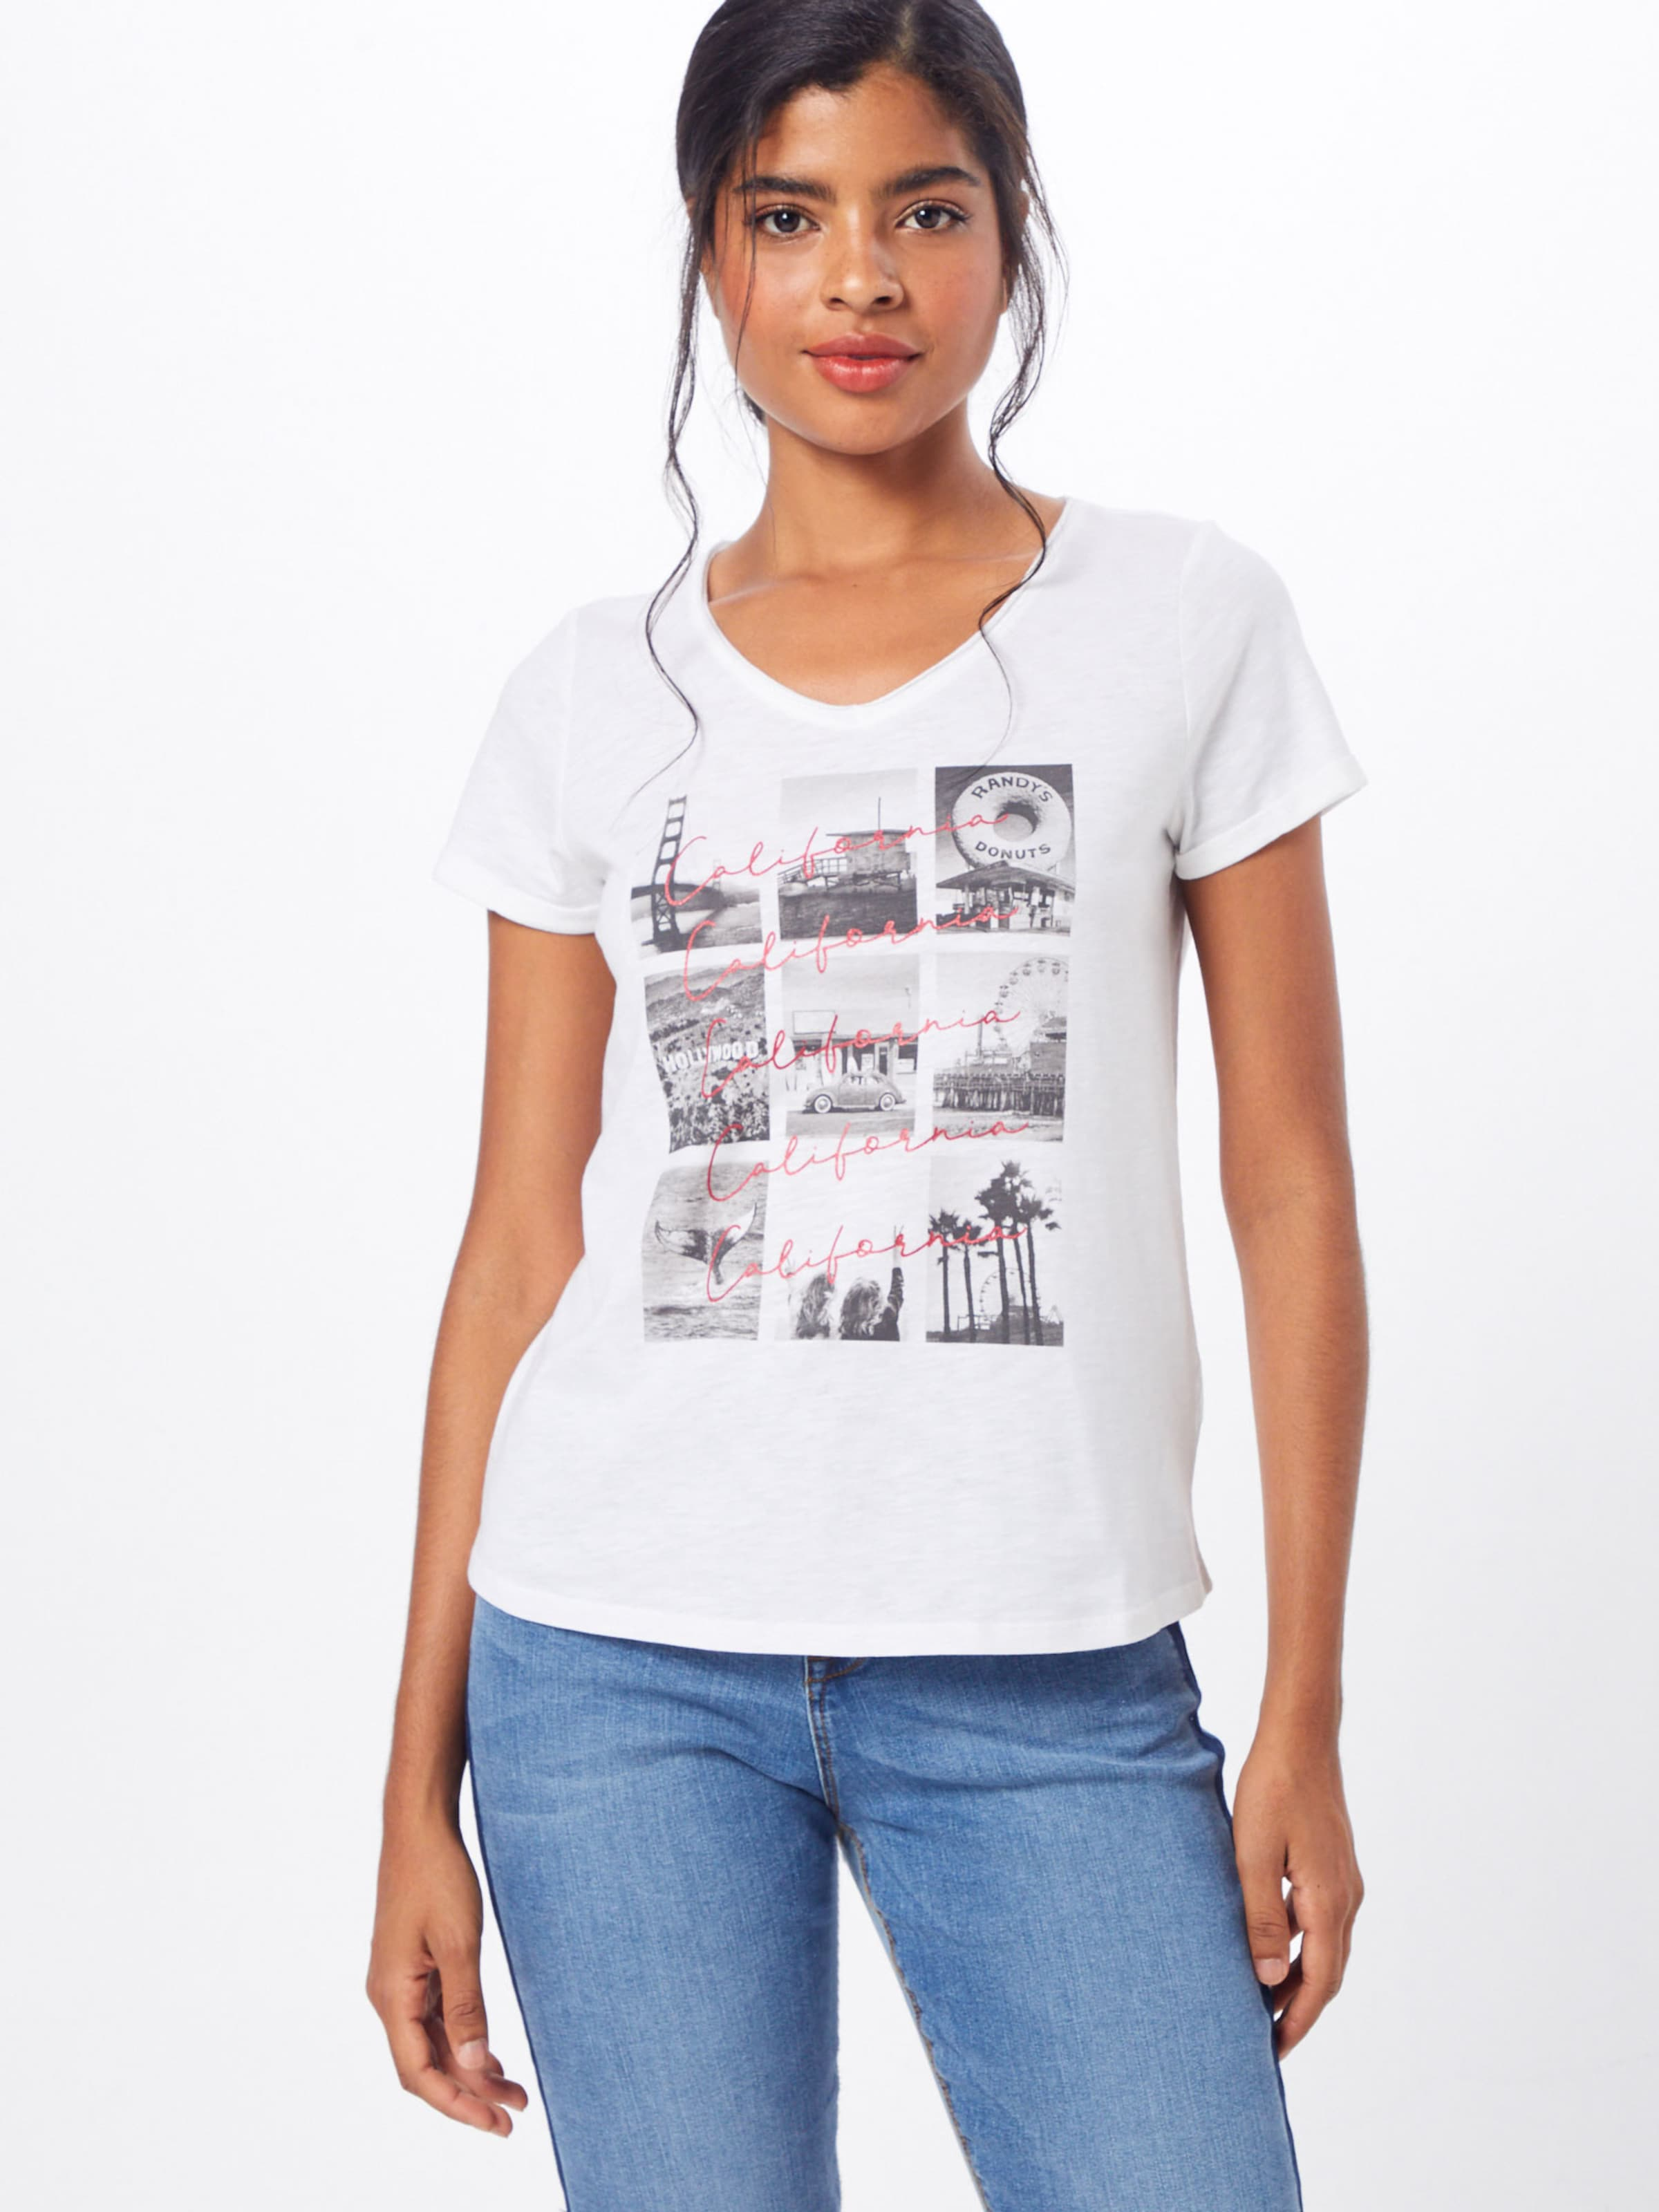 shirt ClairBlanc One En Street T Gris 4RL3A5jq